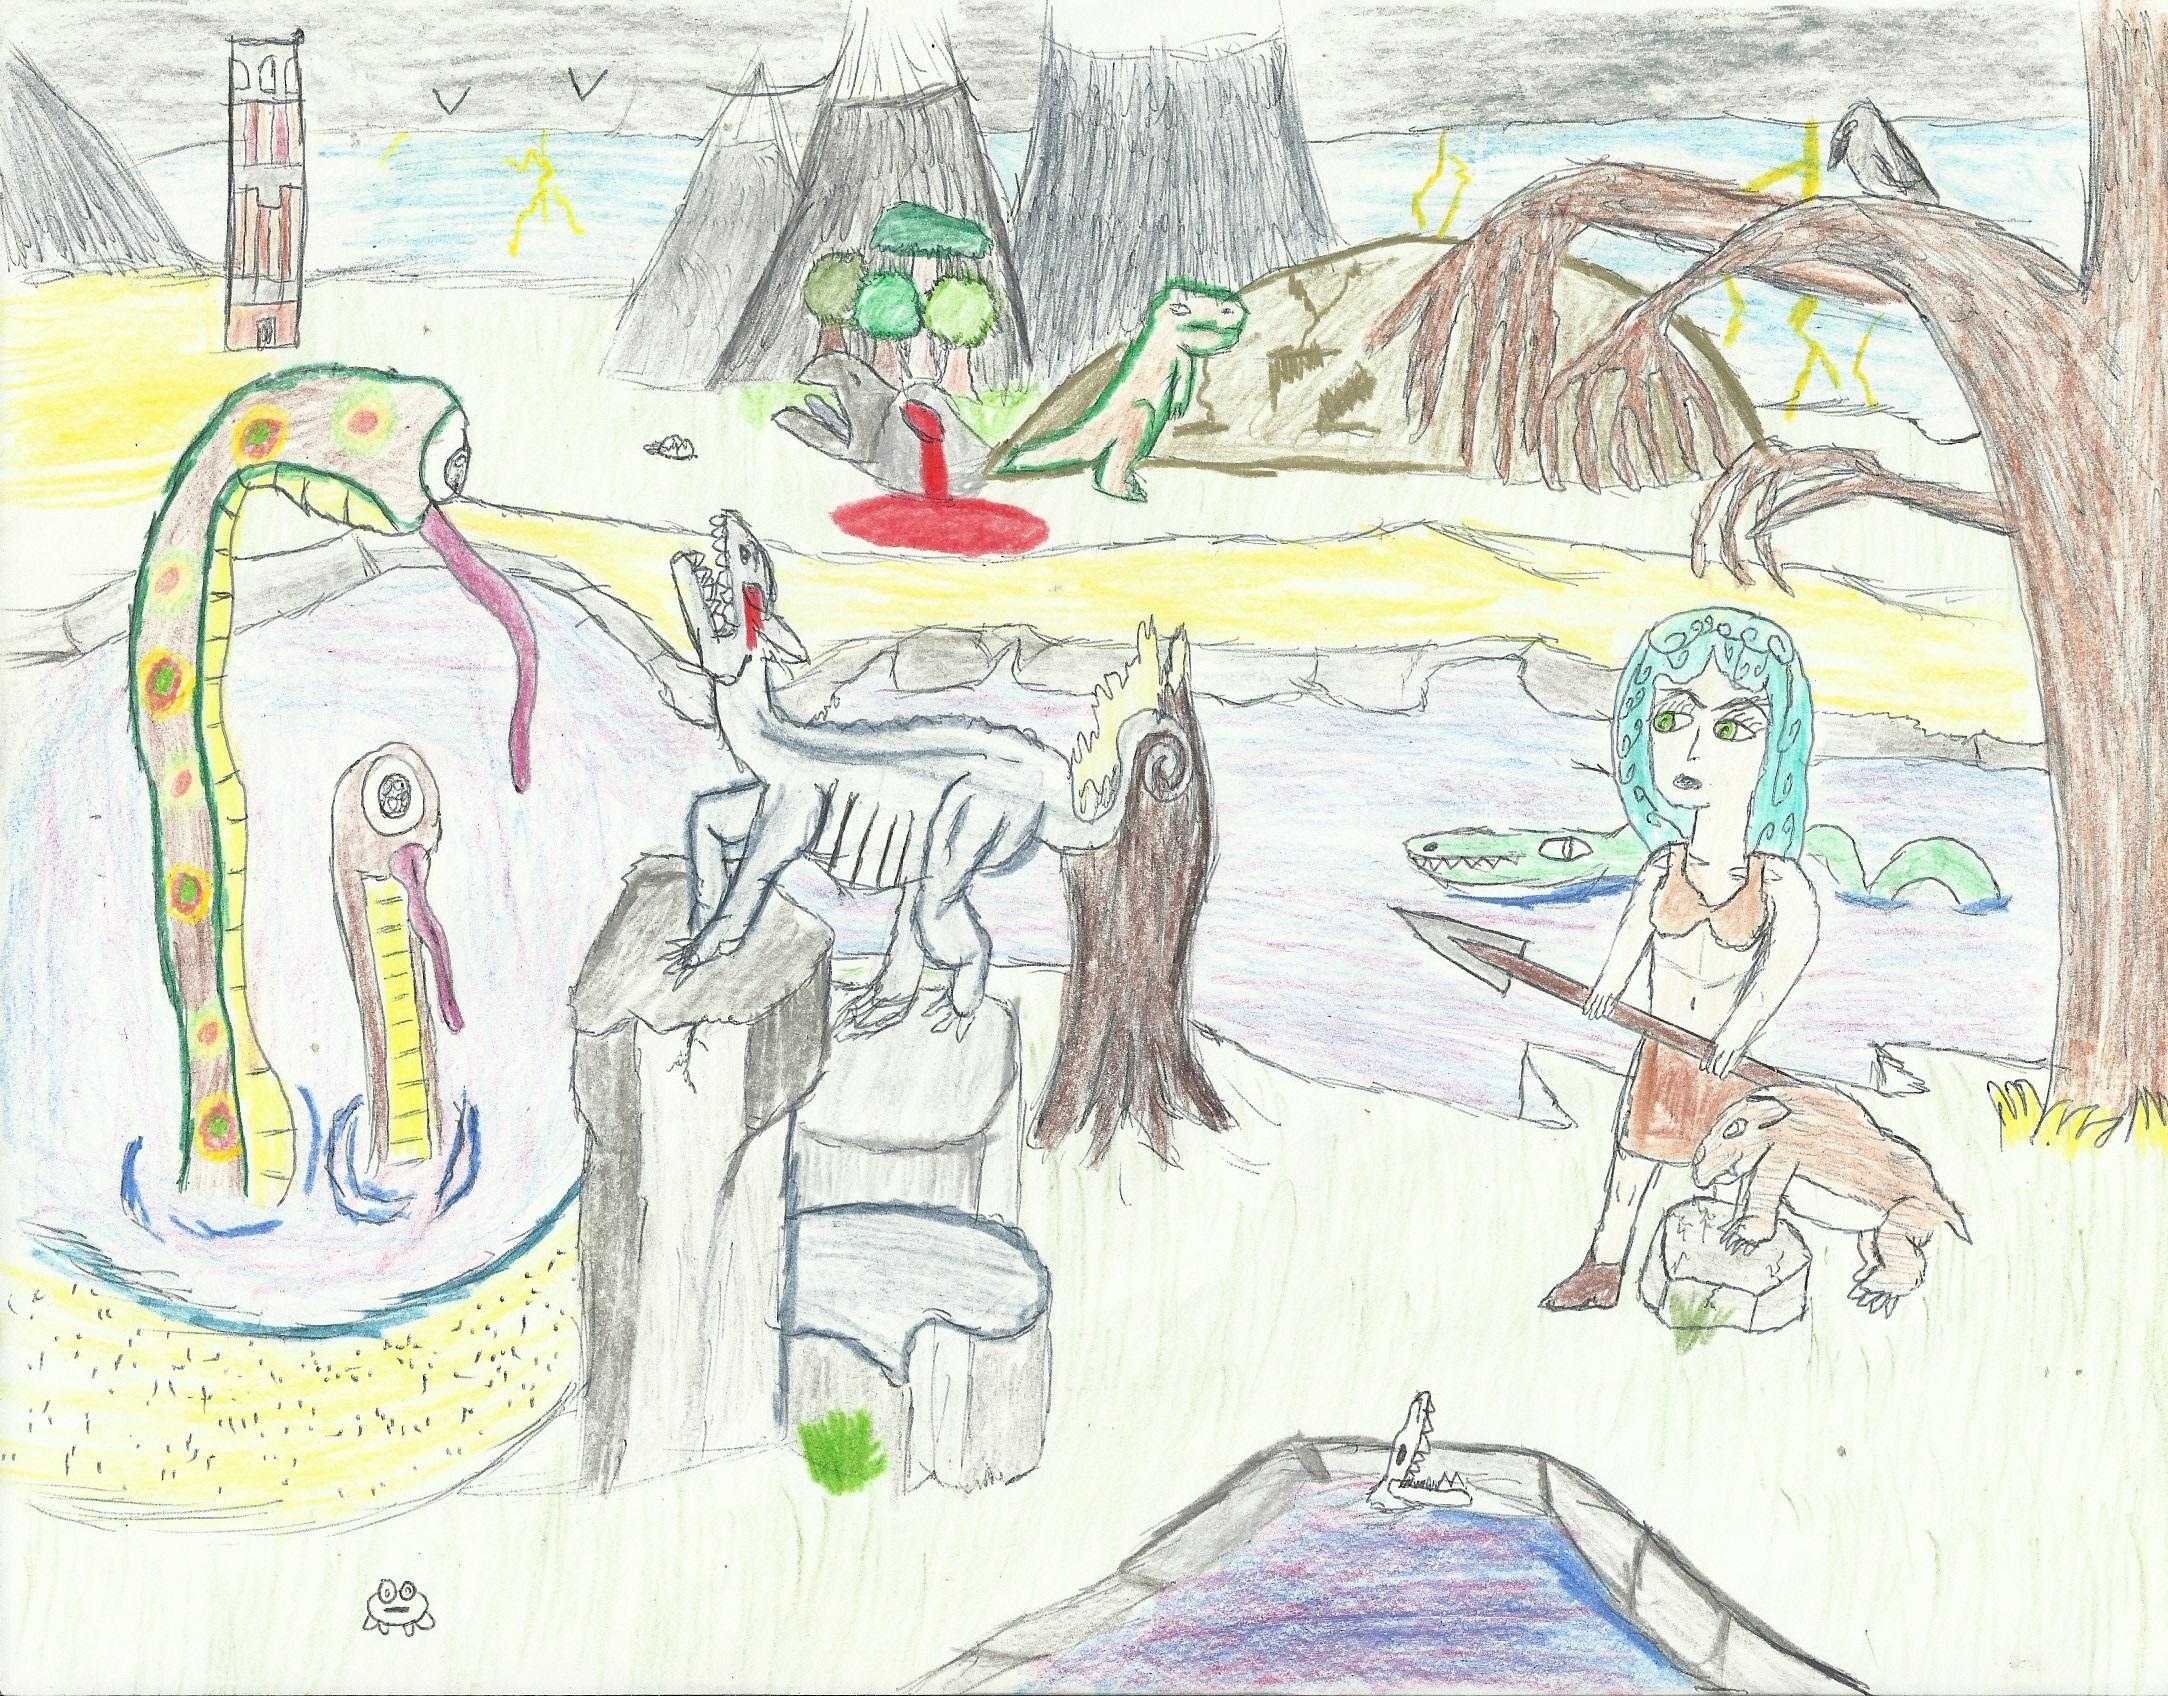 Lana On the Prehistoric Planet 6/09